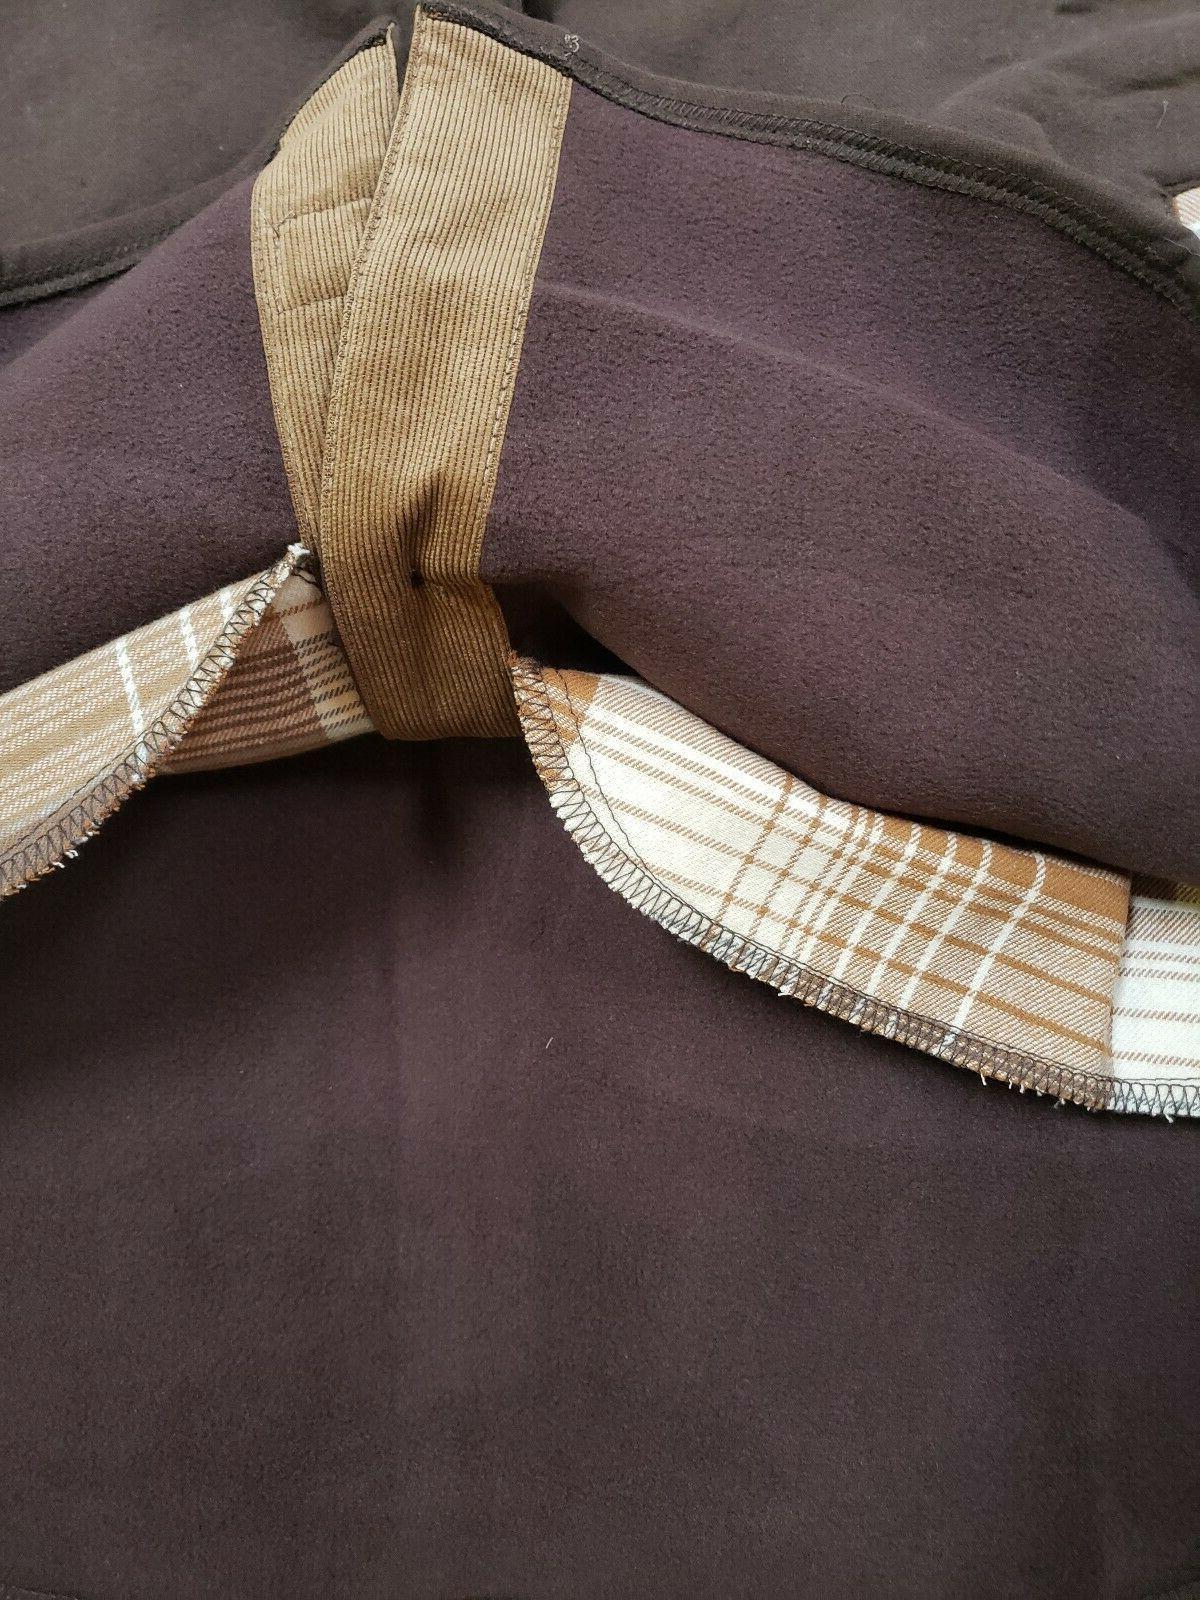 L Mens Legendary Whitetails Flannel WILDERNESS JACKET